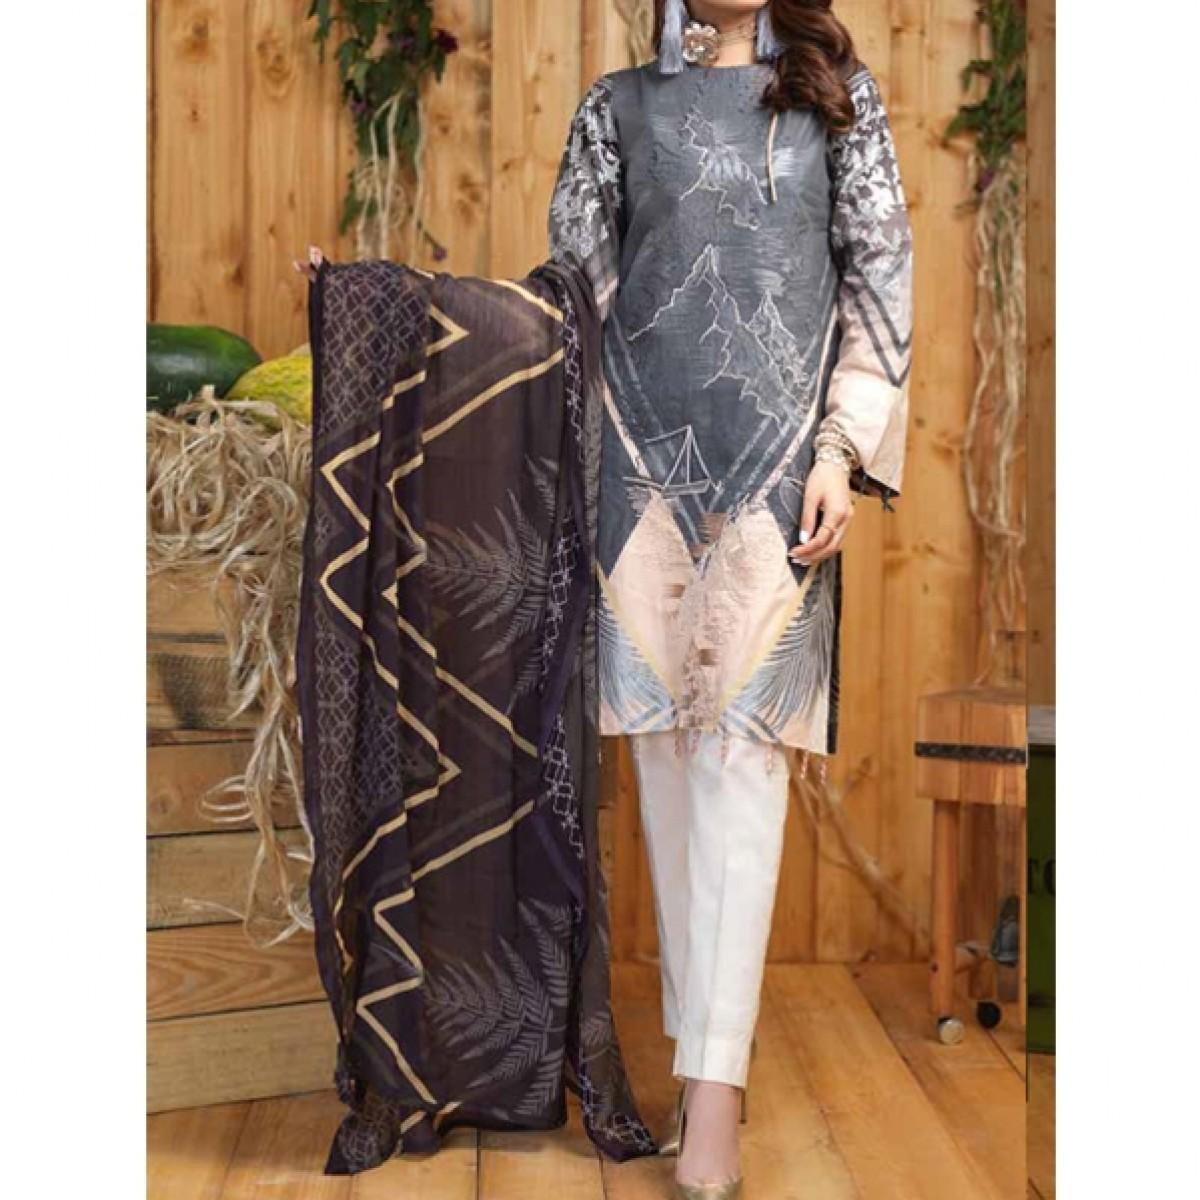 ff1073181a Salitex Silkoria Emb Collection Vol 4 2019 (RC-161B) Price in Pakistan |  Buy Salitex Silkoria Lawn Collection 3 Piece | iShopping.pk